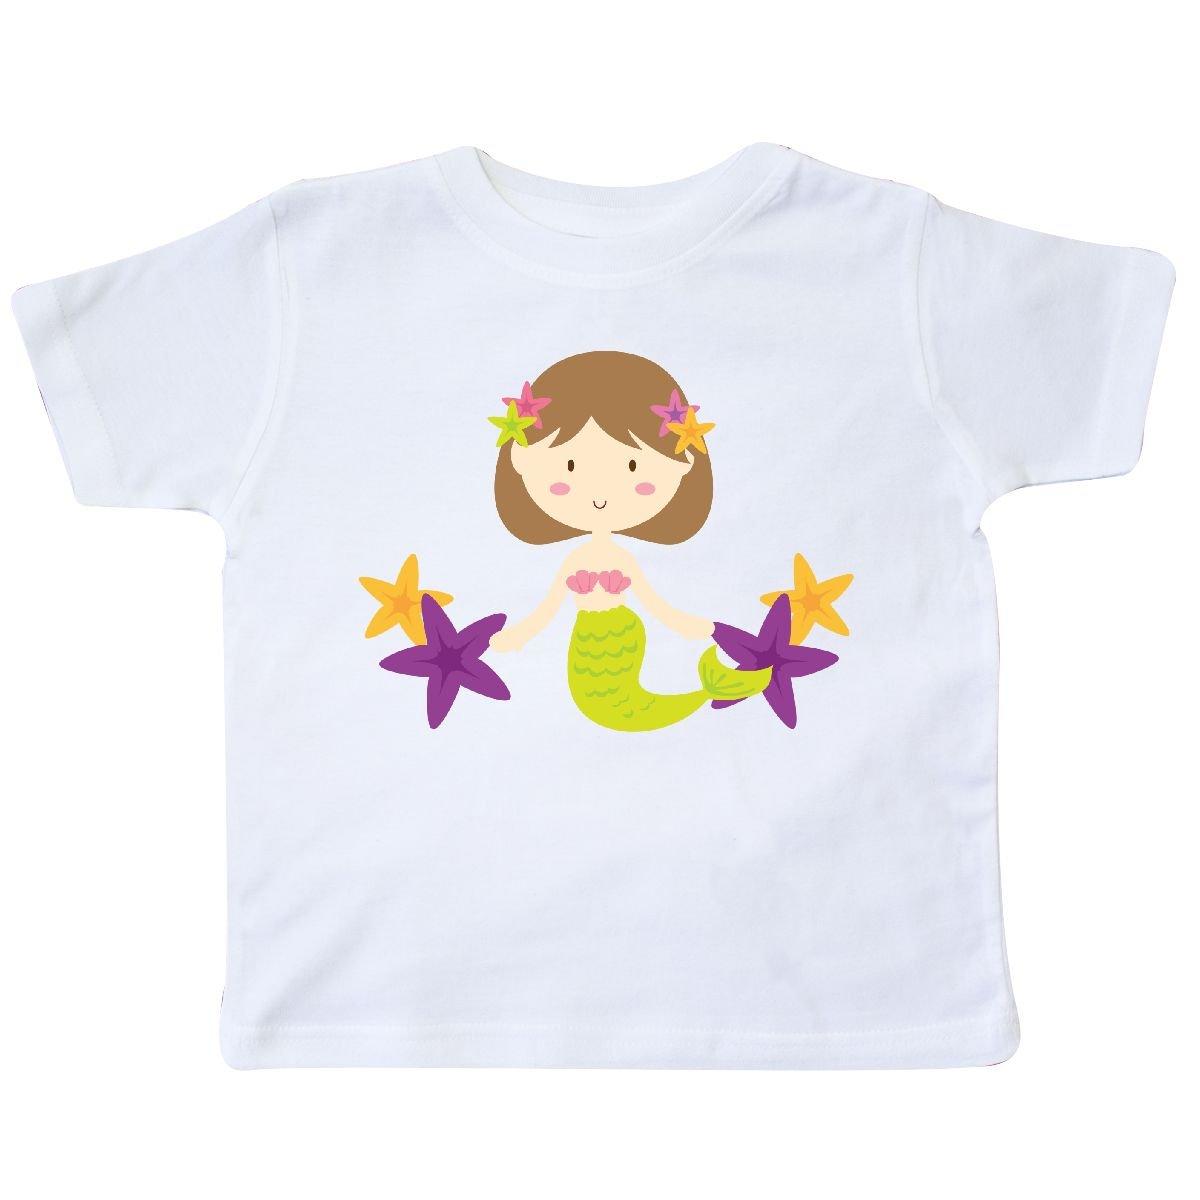 inktastic Mermaid Girl Brown Hair Toddler T-Shirt